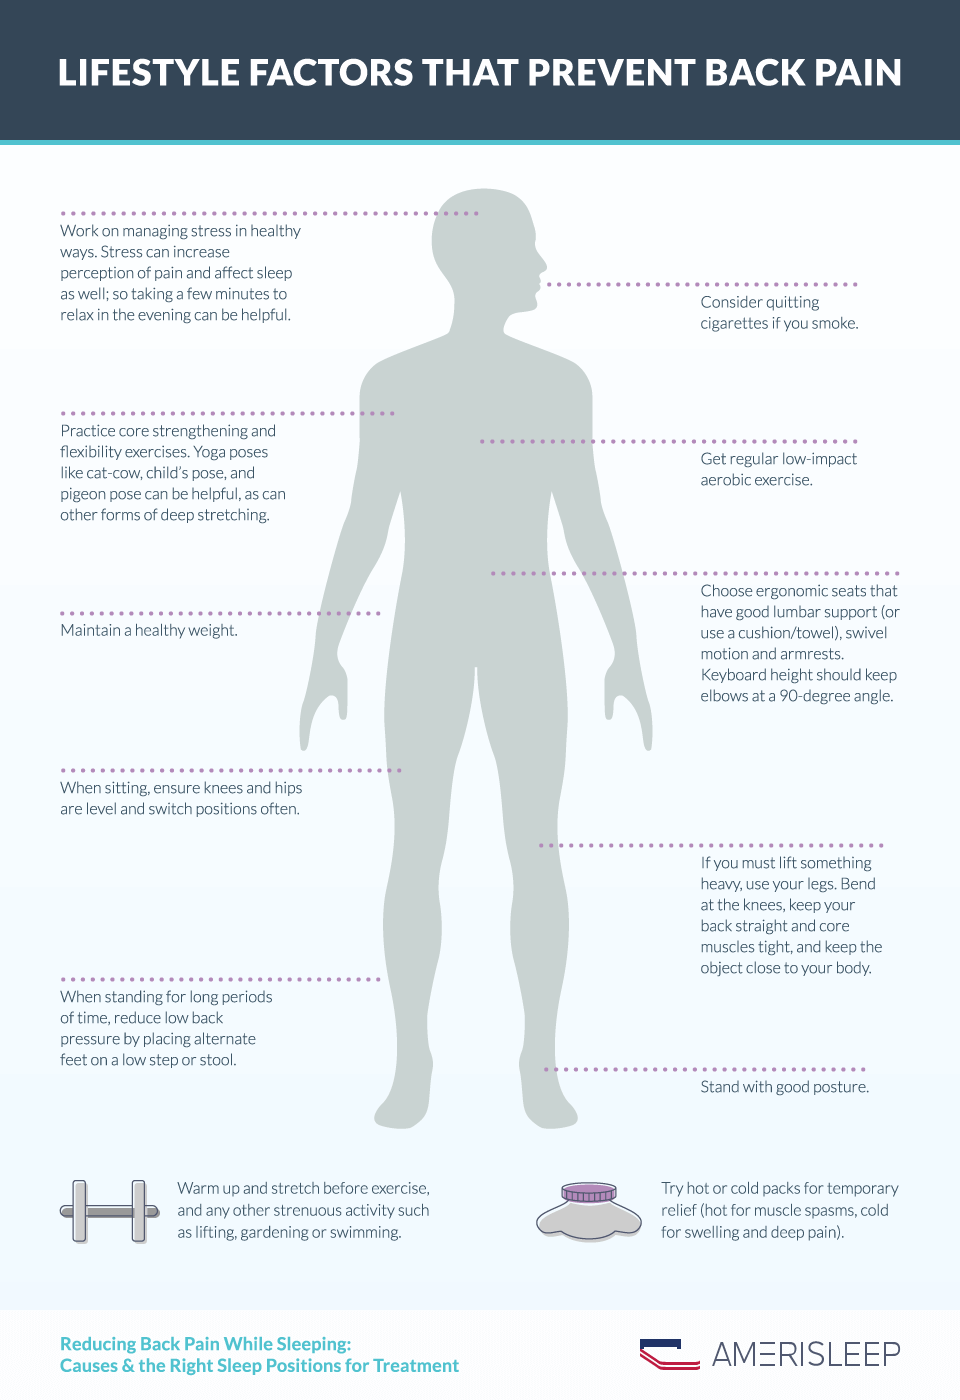 Lifestyle factors to prevent Back Pain